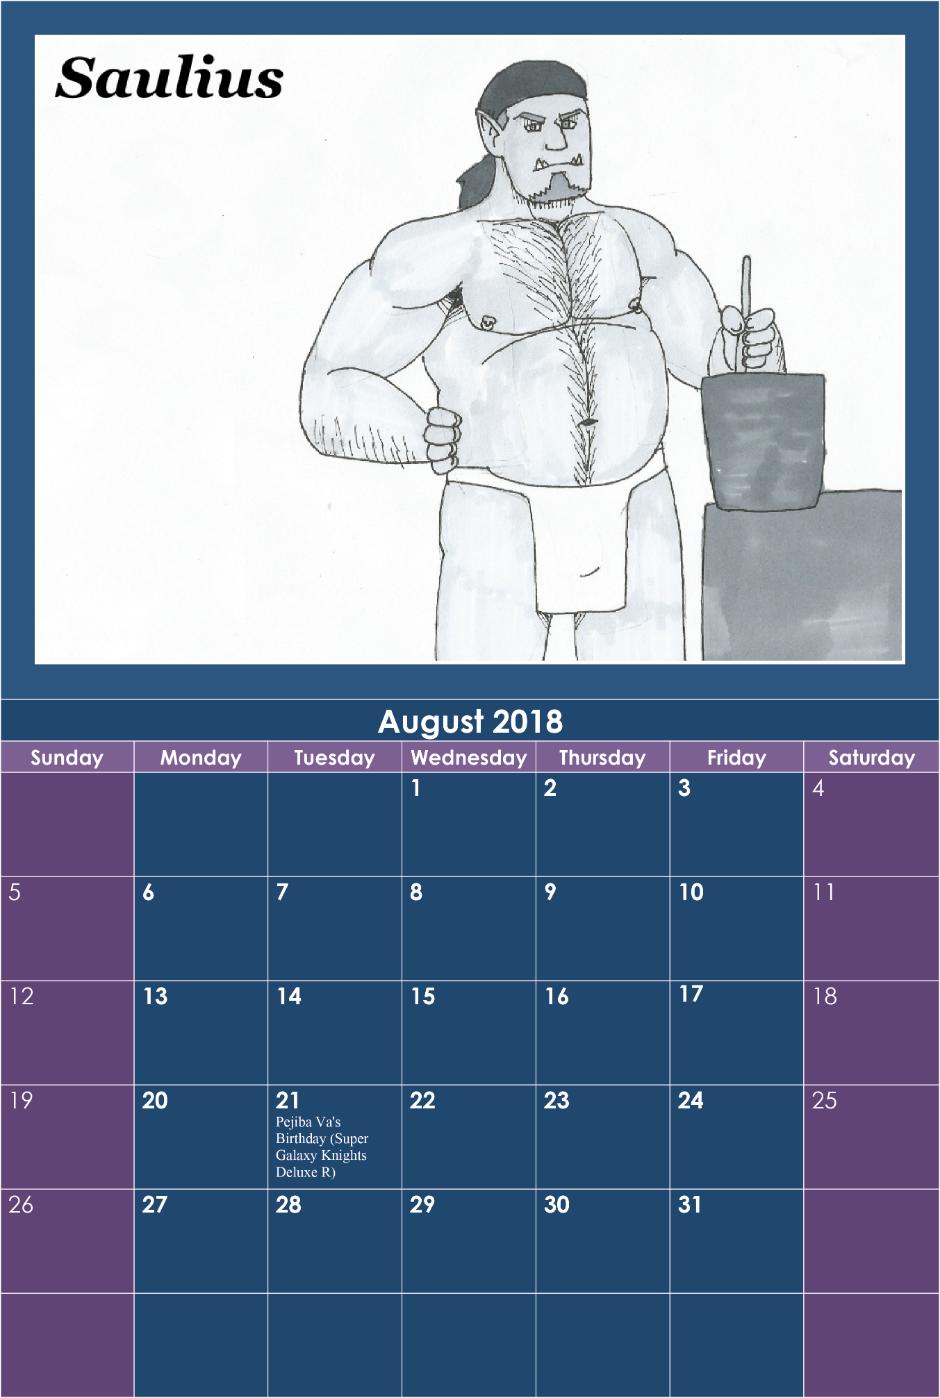 ChristianRepass - August